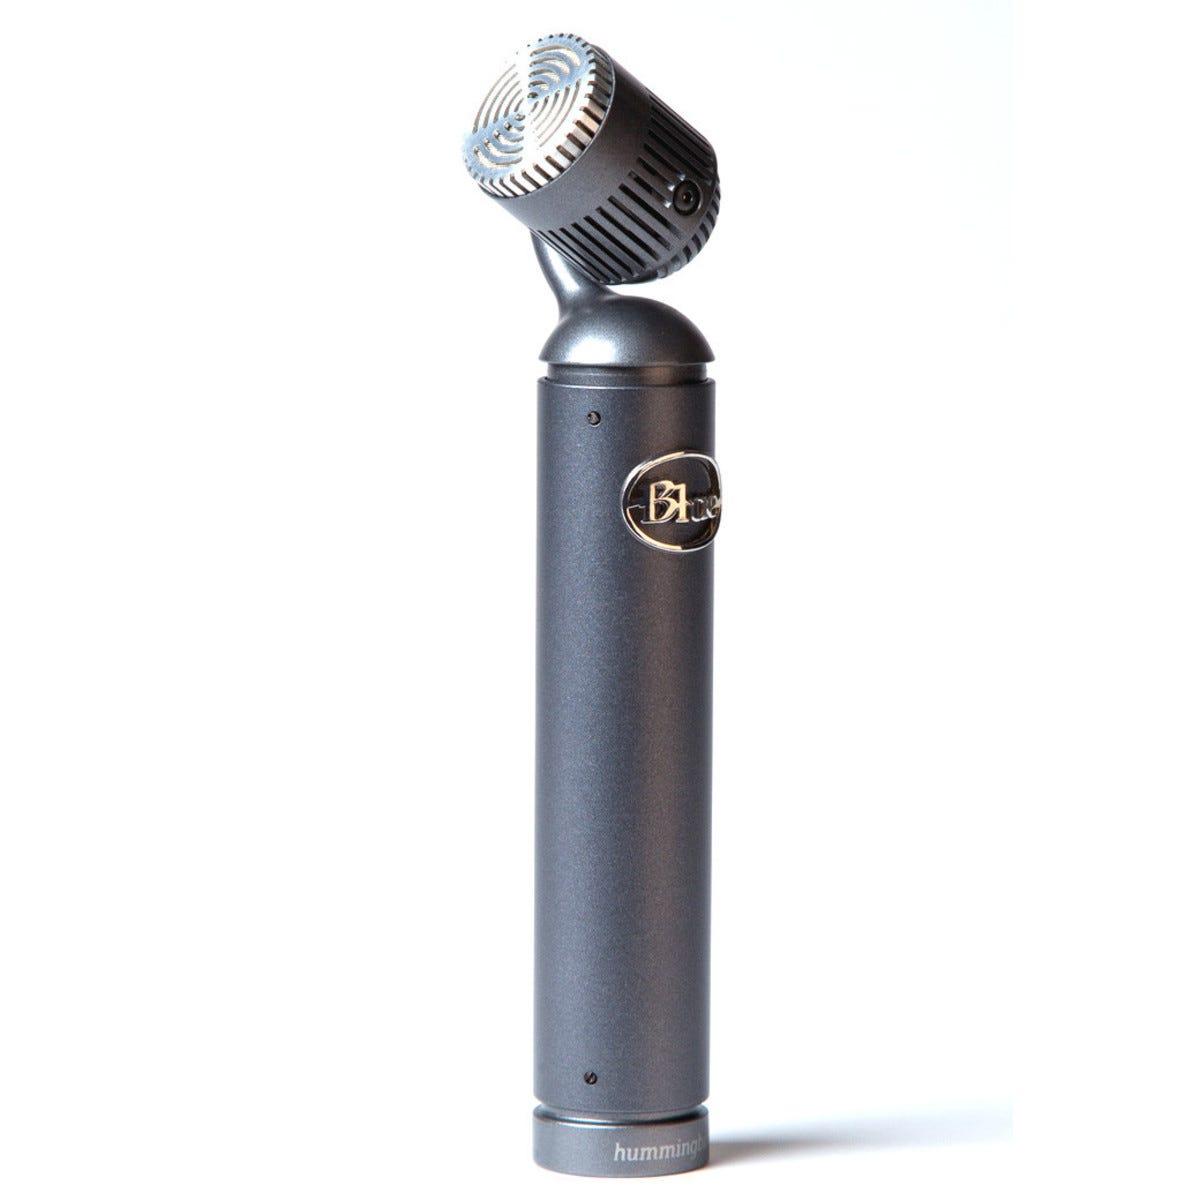 Blue Microphones Hummingbird Small-Diaphragm Condenser Mic